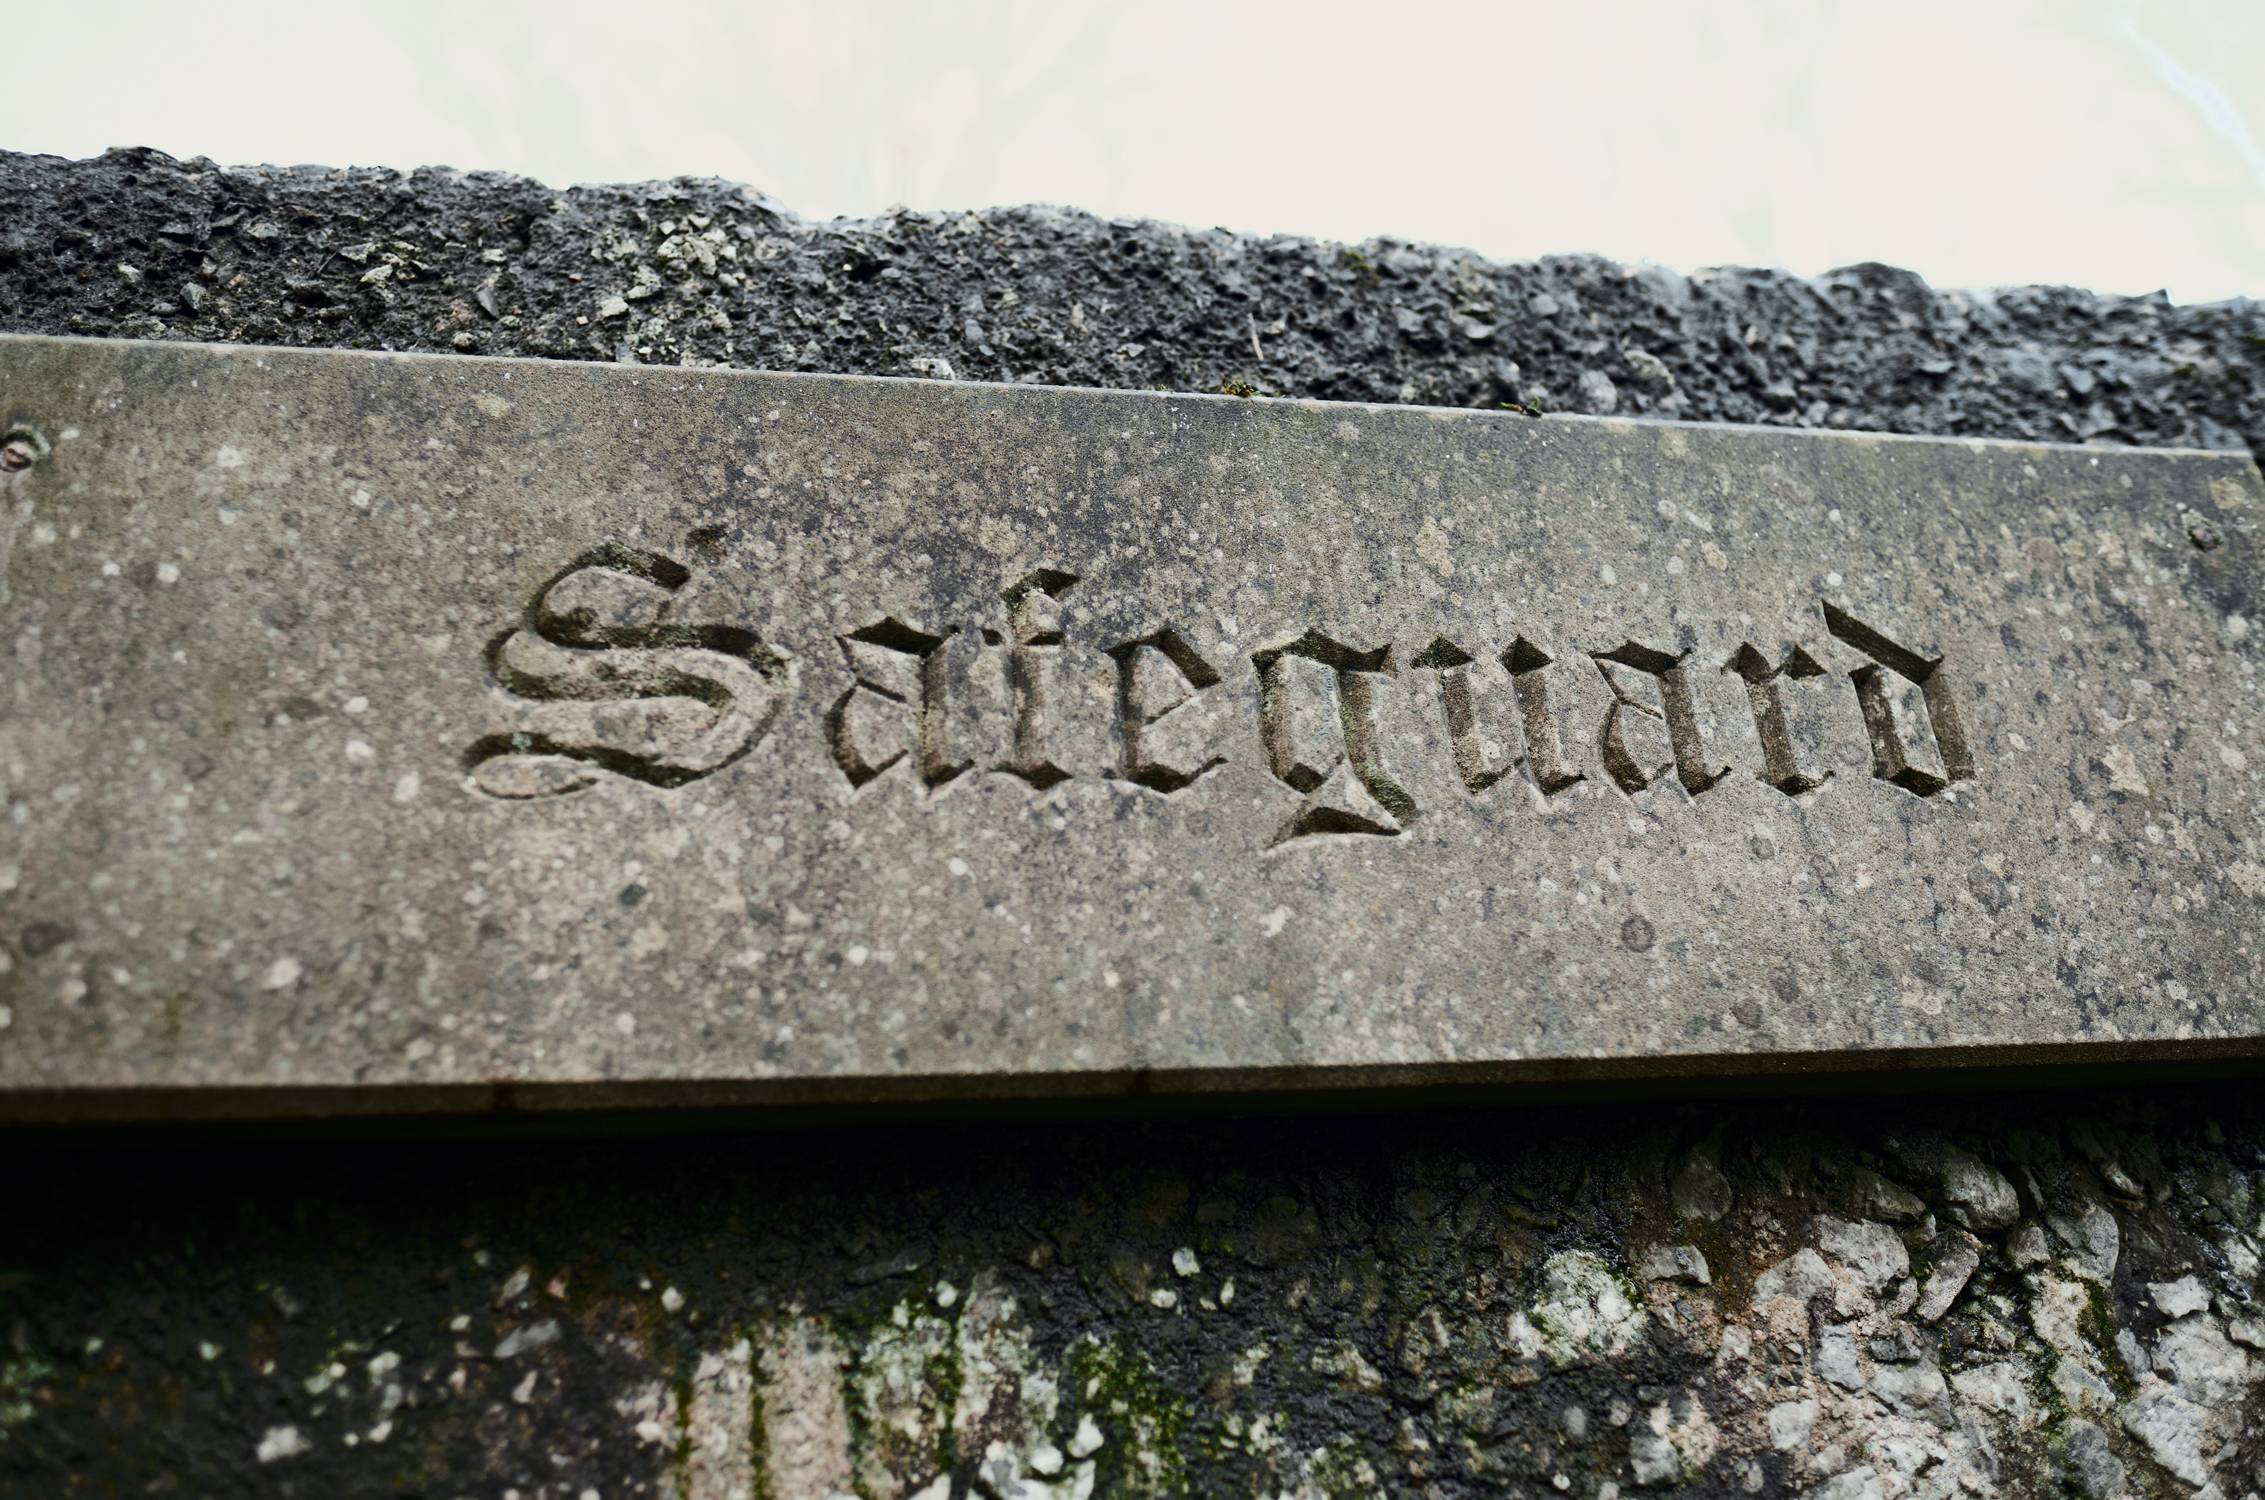 salisbury pill box 29.jpg